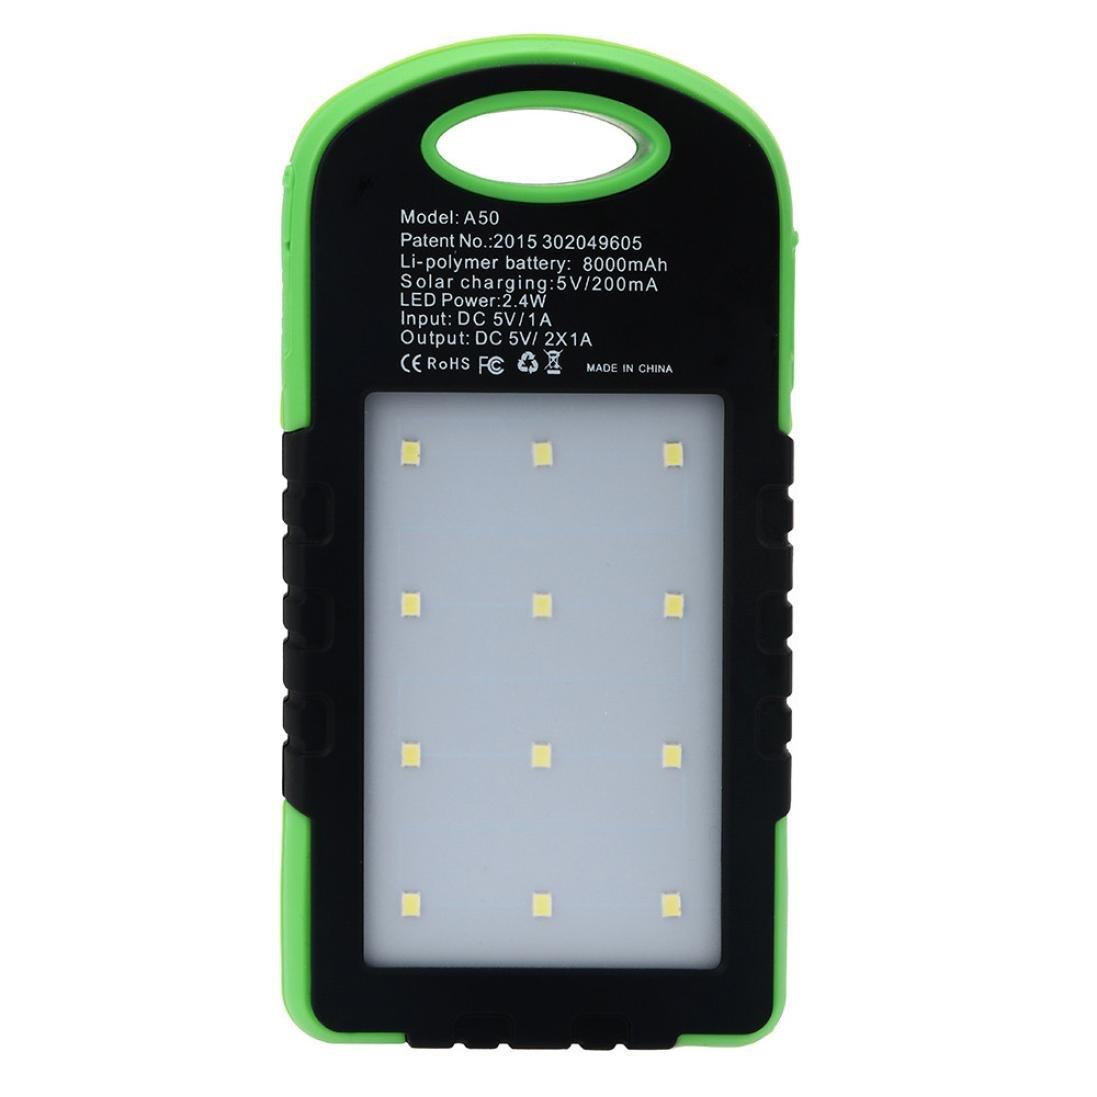 Gotd 10000mAh Portable Solar Charger LED Dual USB External Battery Power Bank, Green